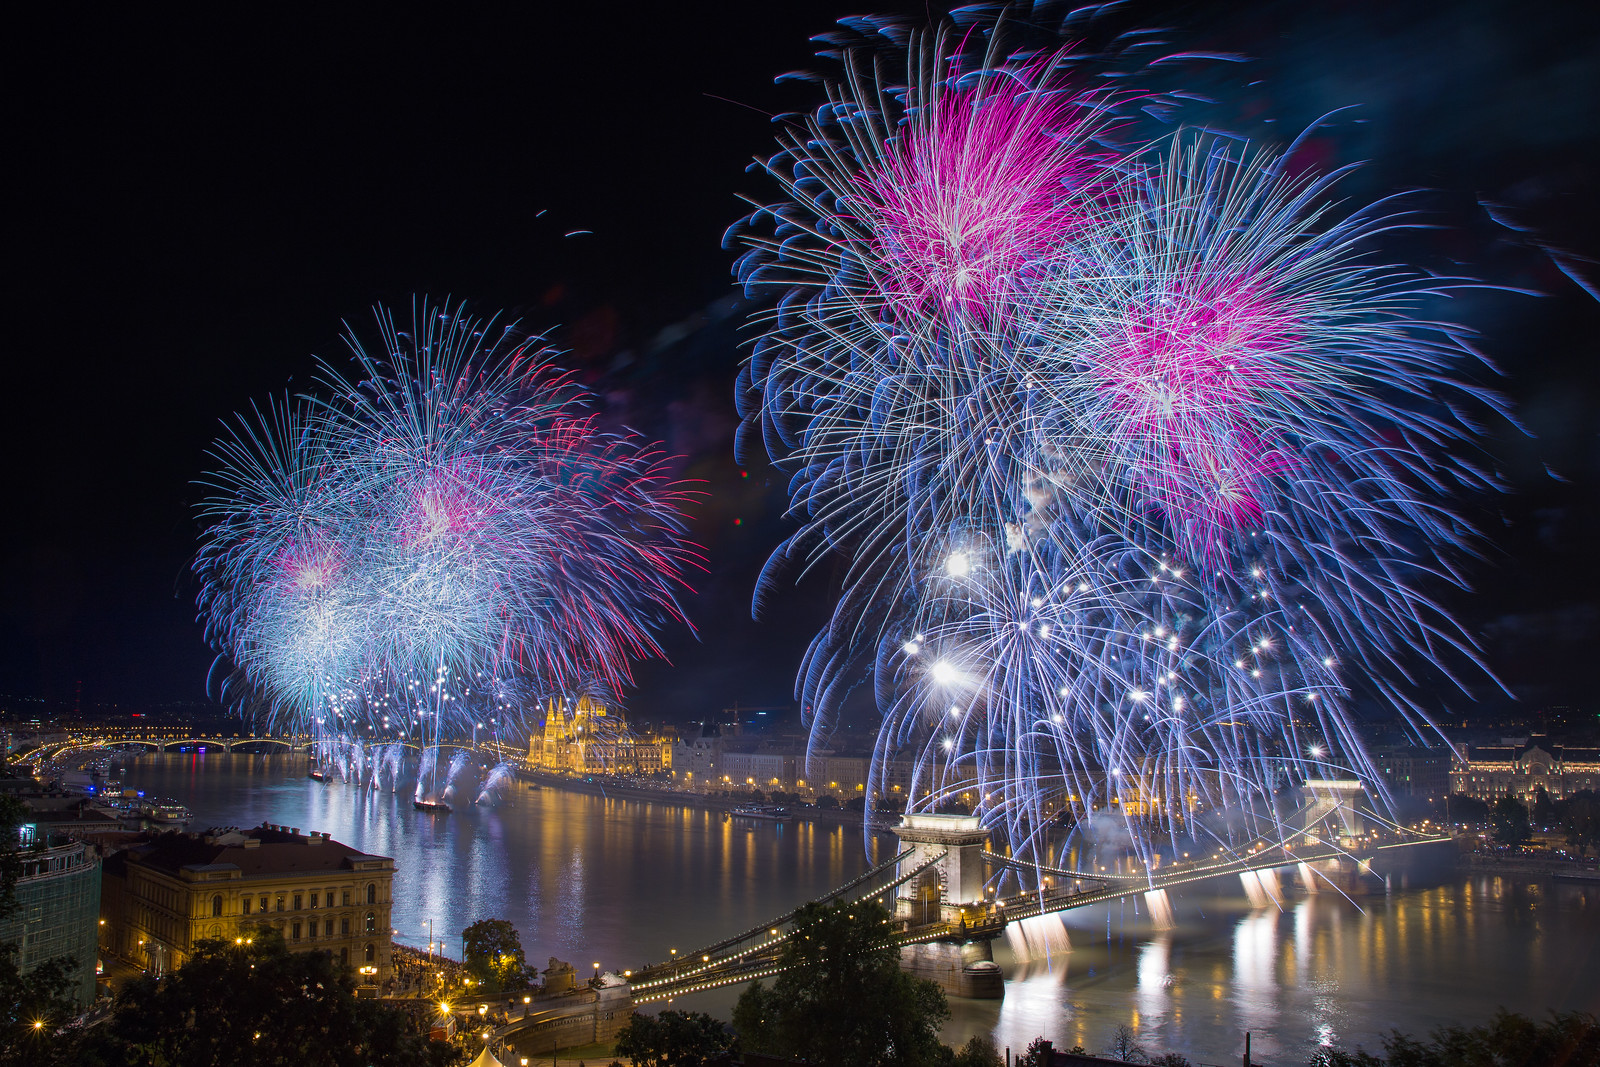 budapest fireworks st stephen day chain bridge